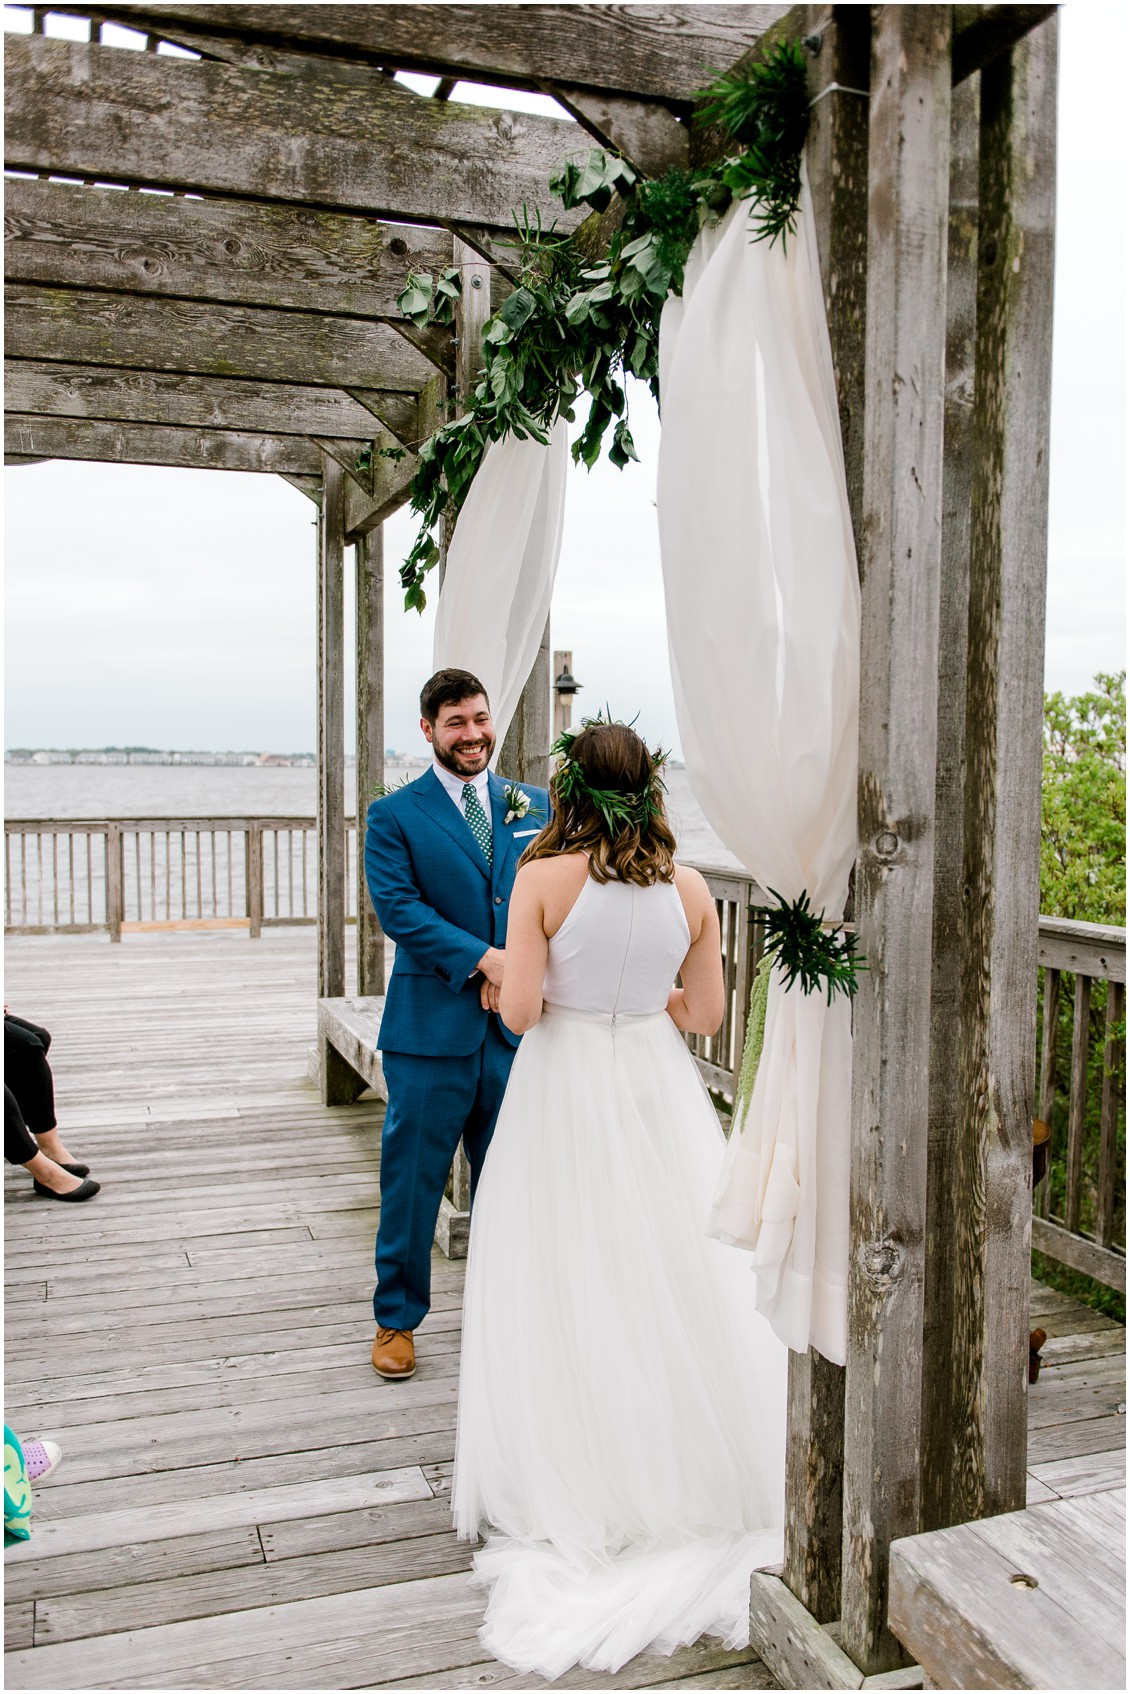 Groom and bride ceremony naturally beautiful wedding | My Eastern Shore Wedding | Erin Wheeler Photography | Bayside Resort Golf Club | My Eastern Shore Wedding | Erin Wheeler Photography | Bayside Resort Golf Club